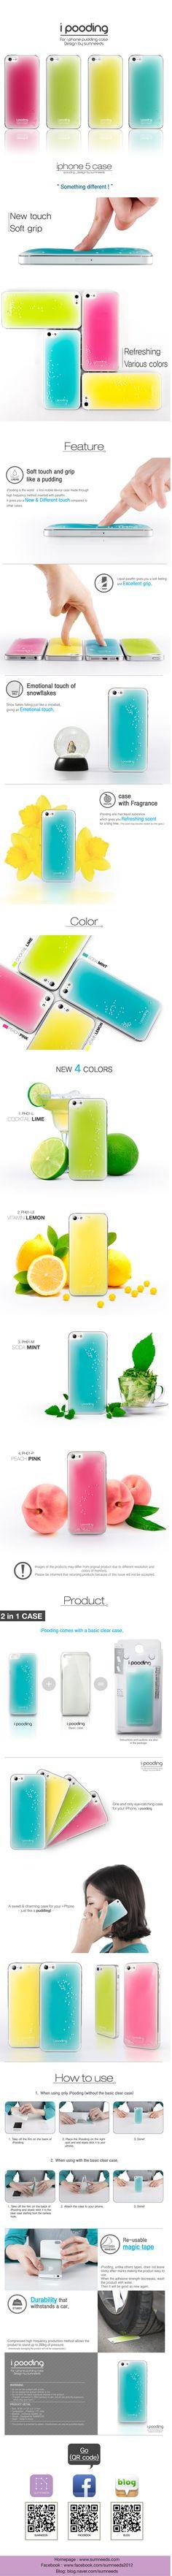 iPooding iPhone5 case